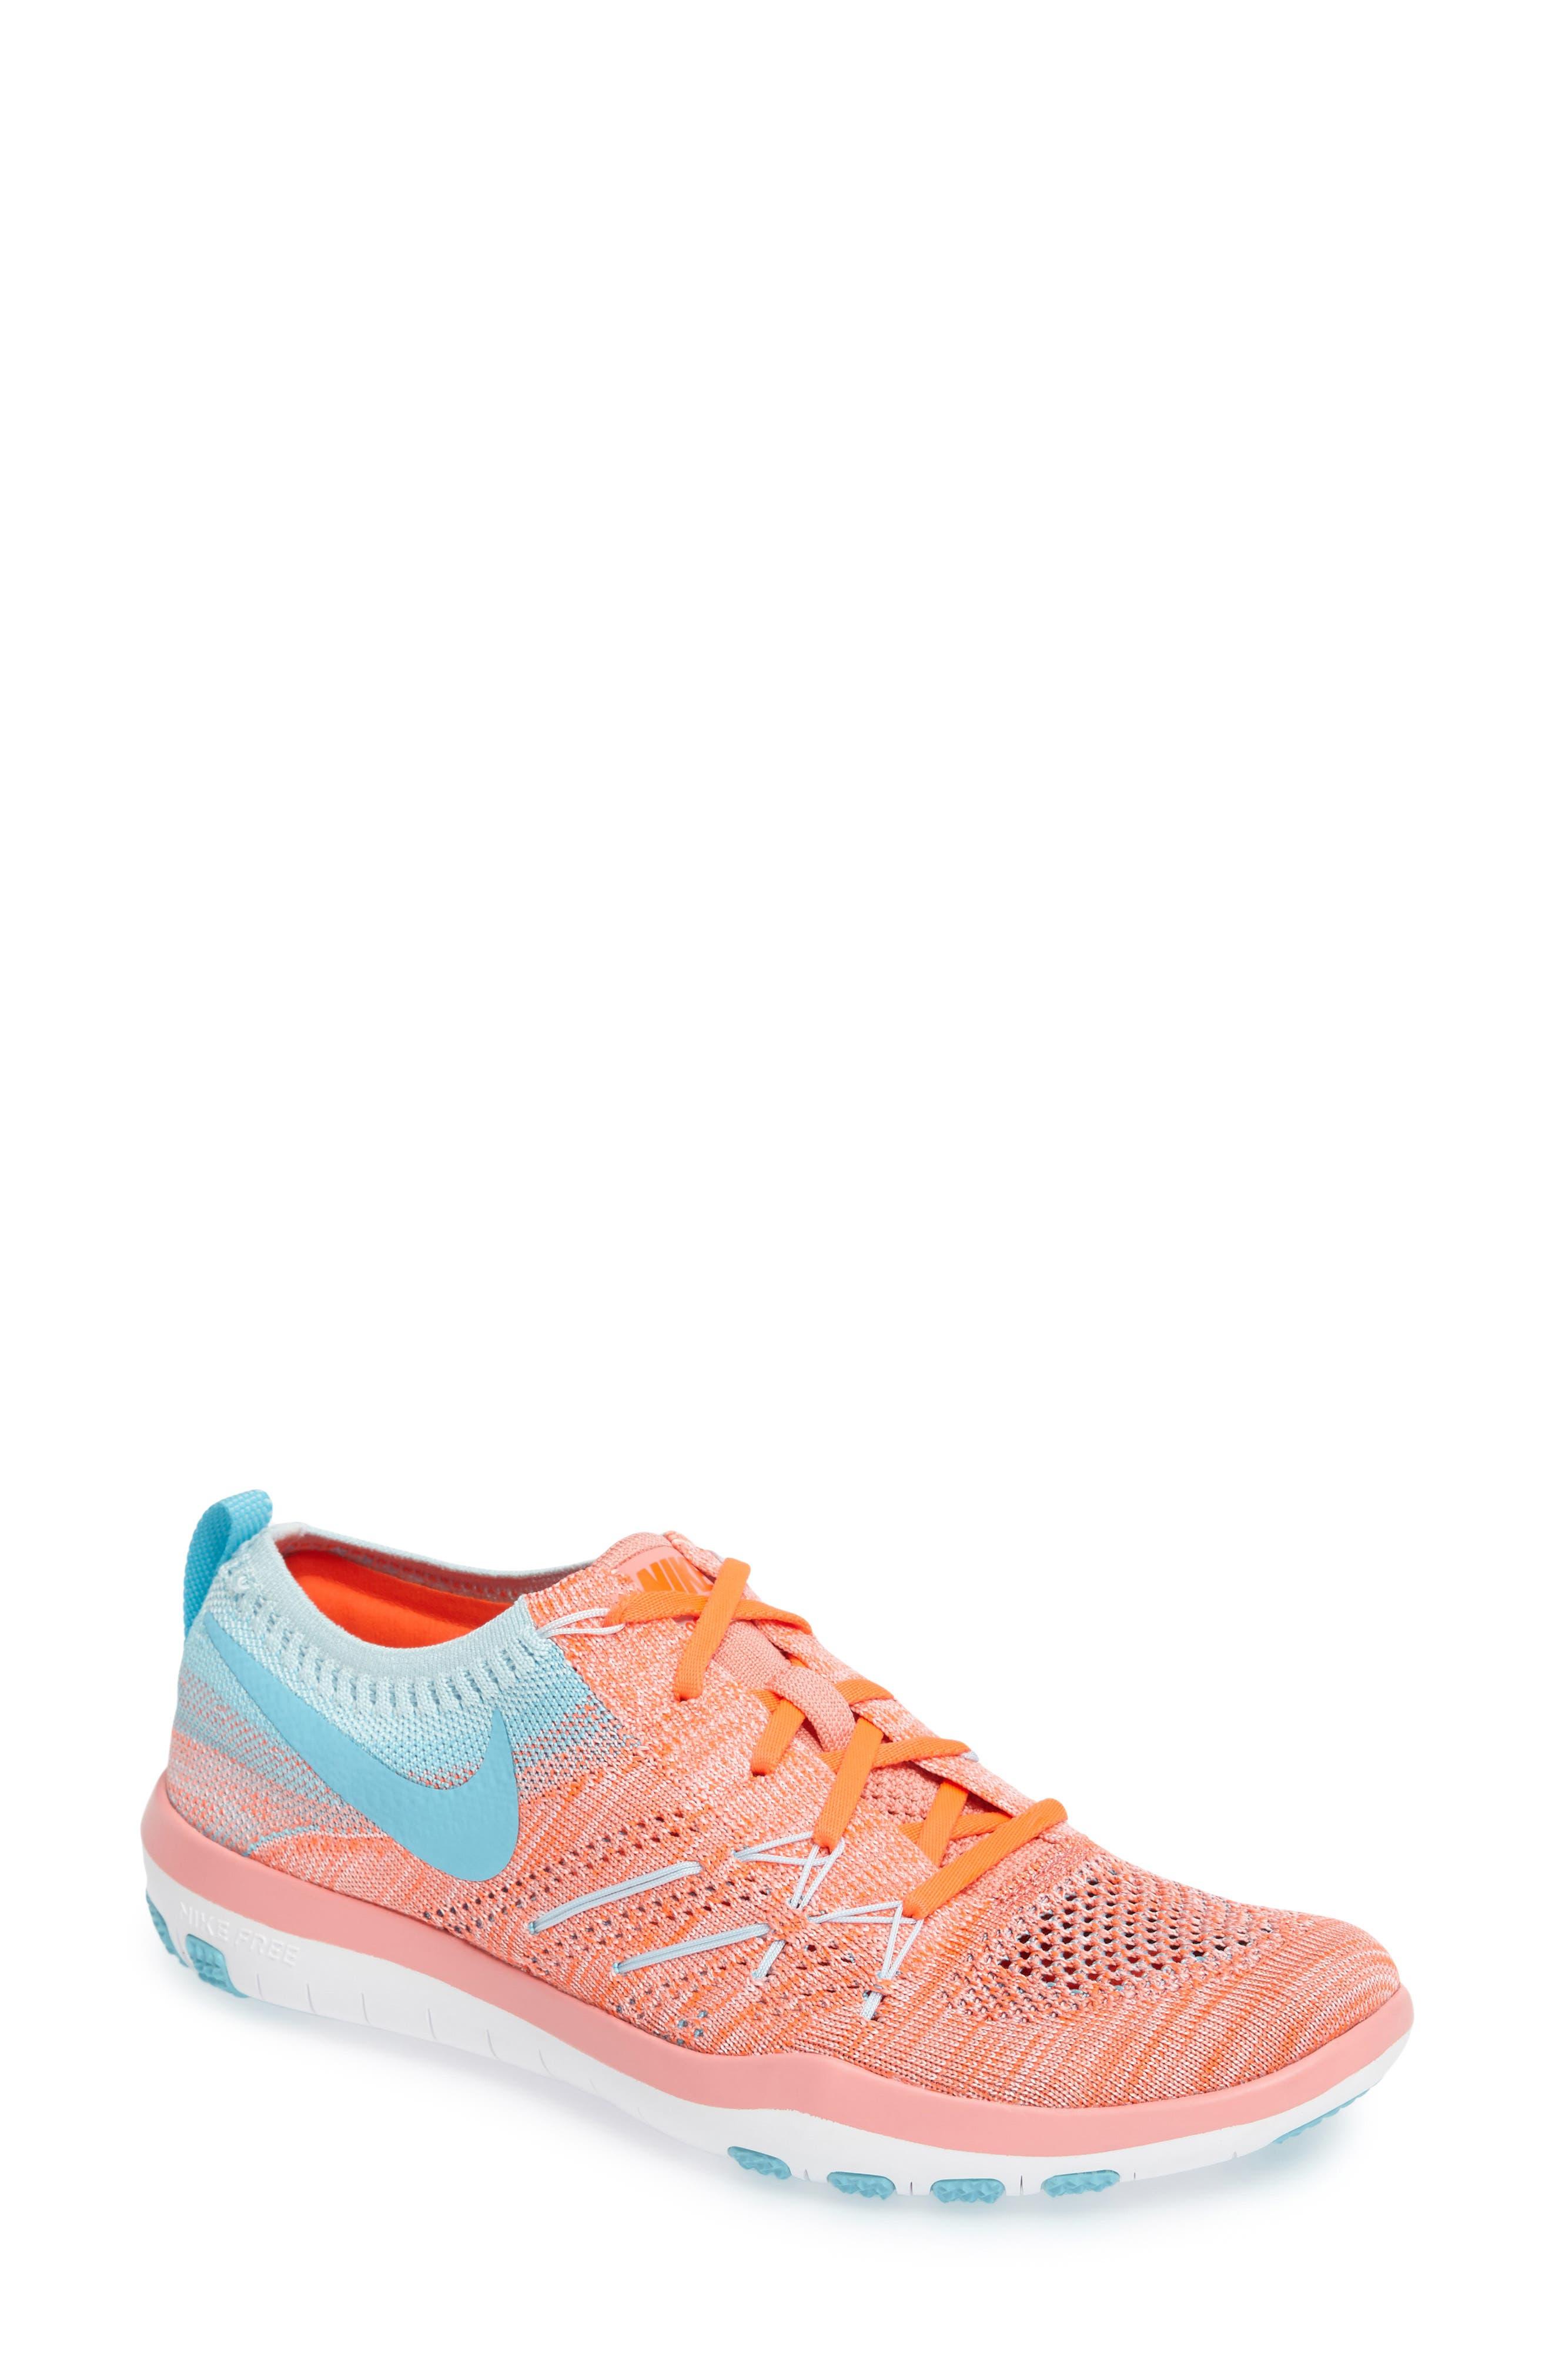 Alternate Image 1 Selected - Nike 'Free TR Focus Flyknit' Training Shoe (Women)